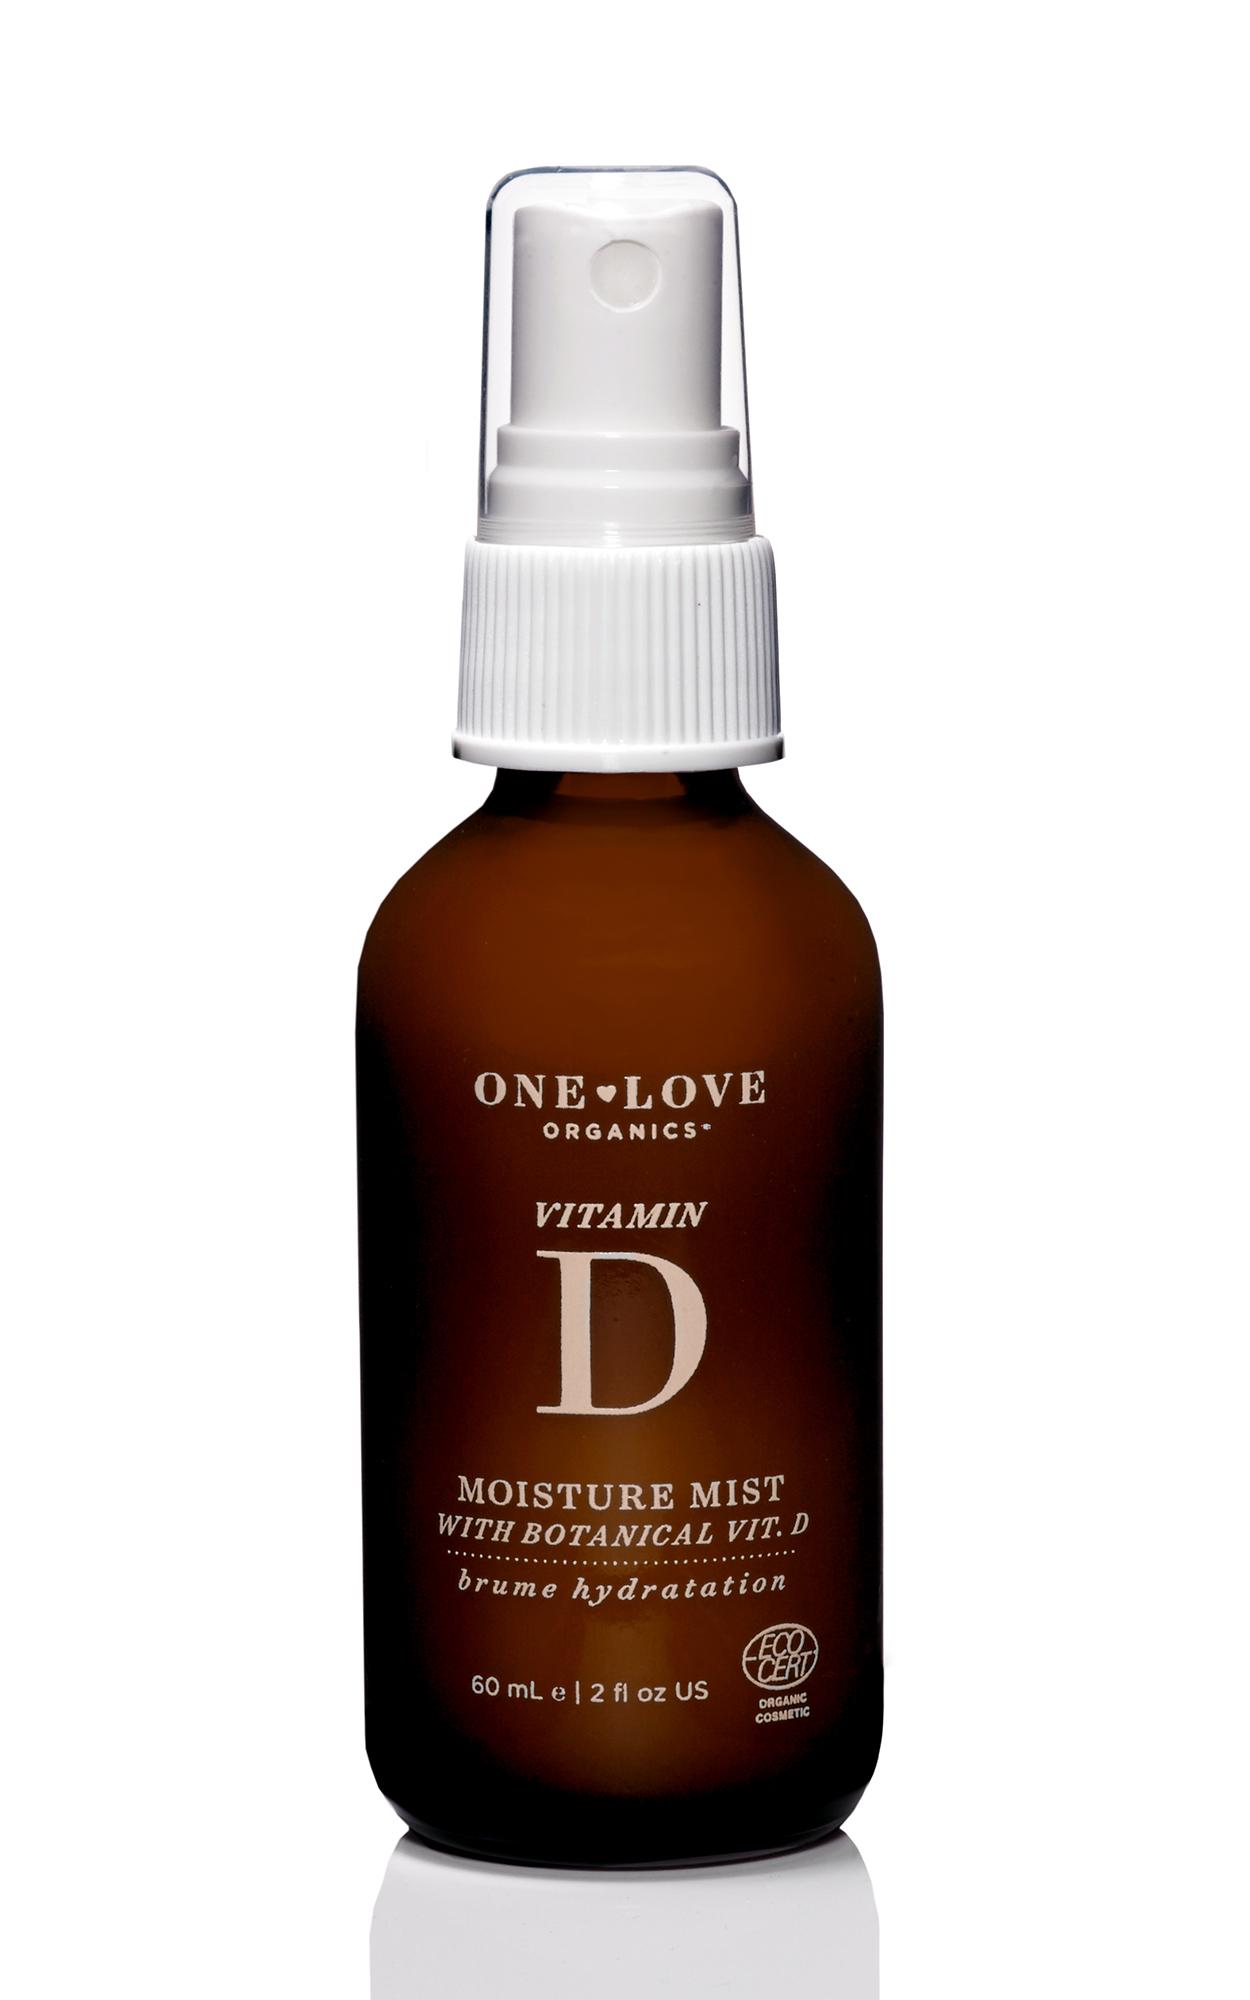 One Love Vitamin D Moisture Mist, Available at One Love Organics